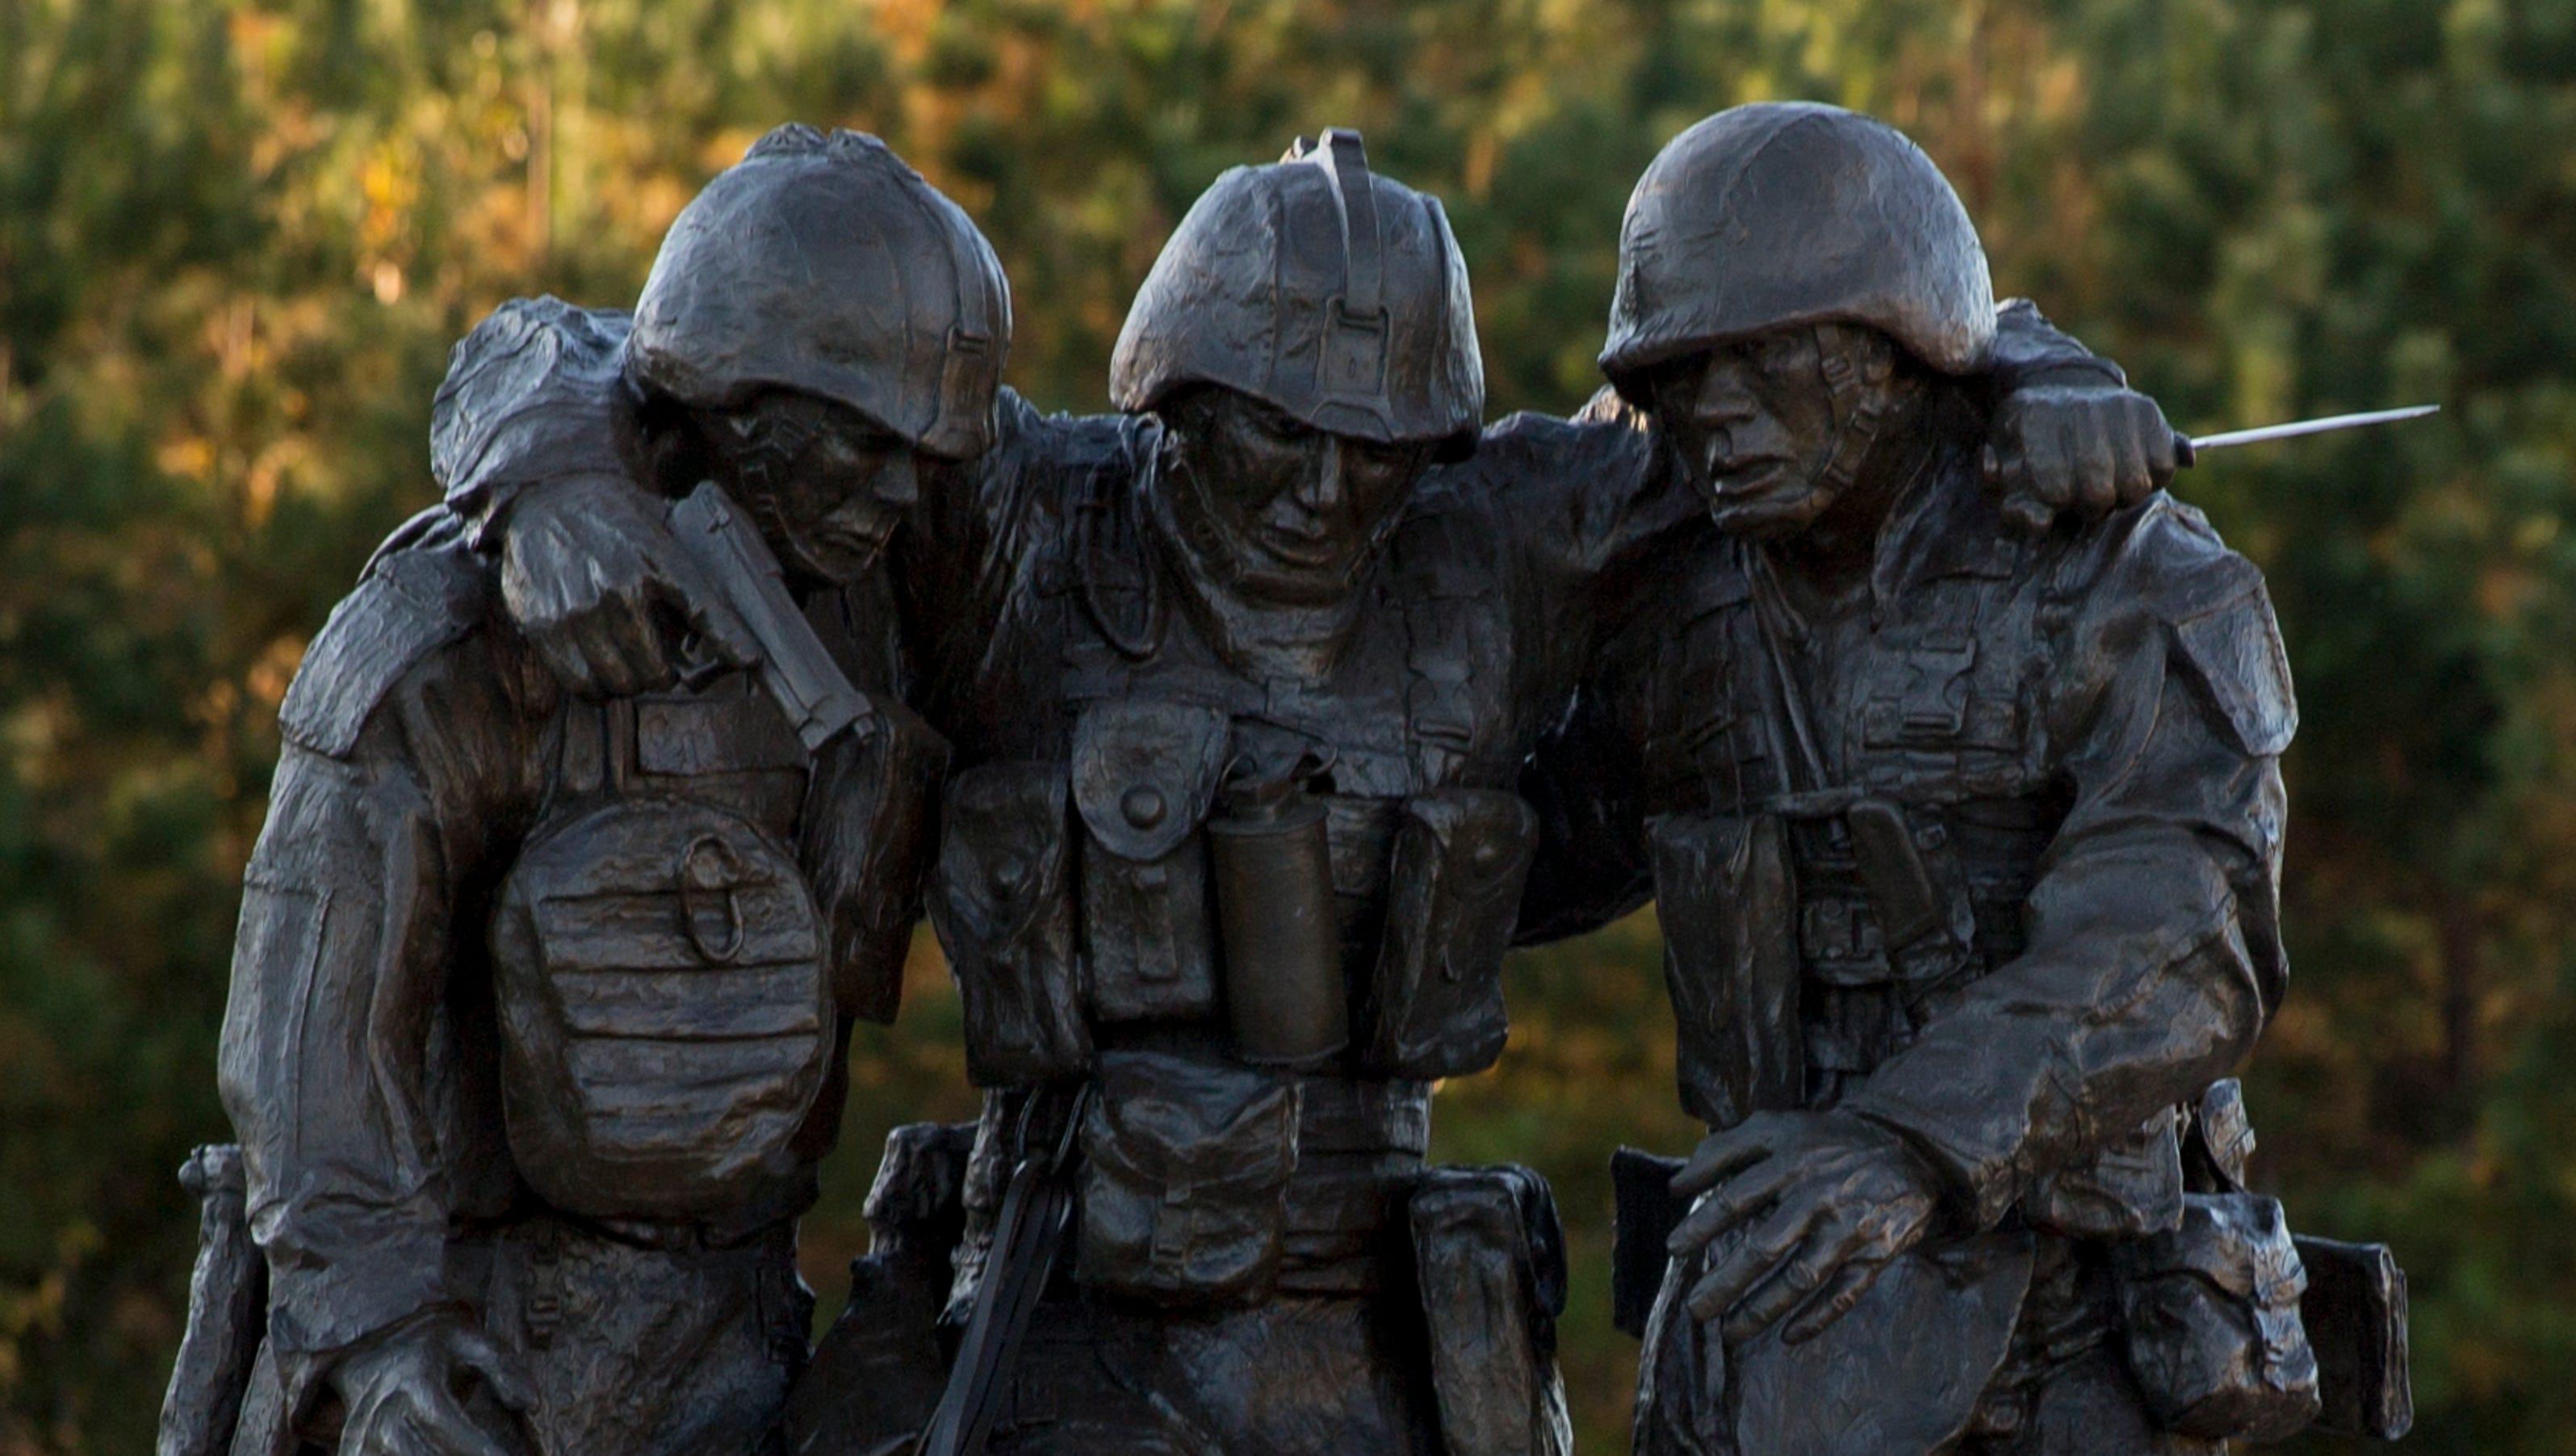 Statue honoring iconic Fallujah photo unveiled at Pendleton